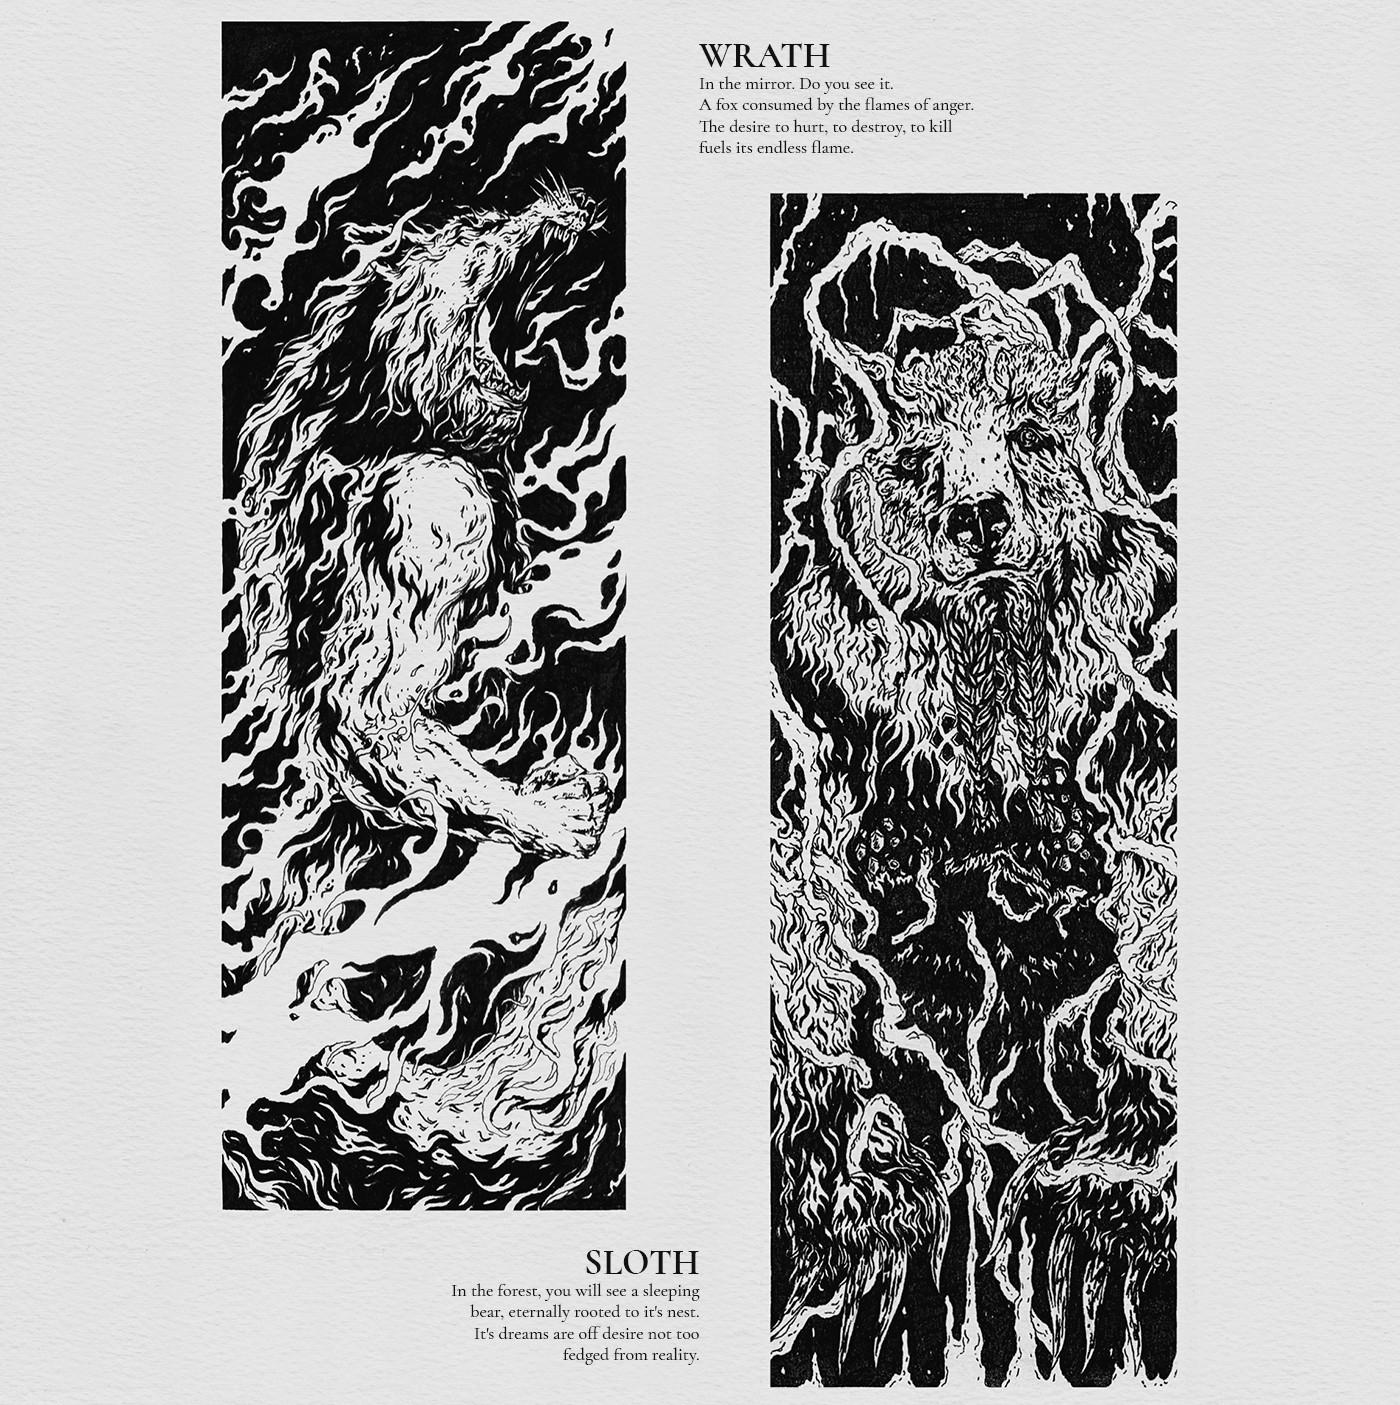 Wrath of anger — 15